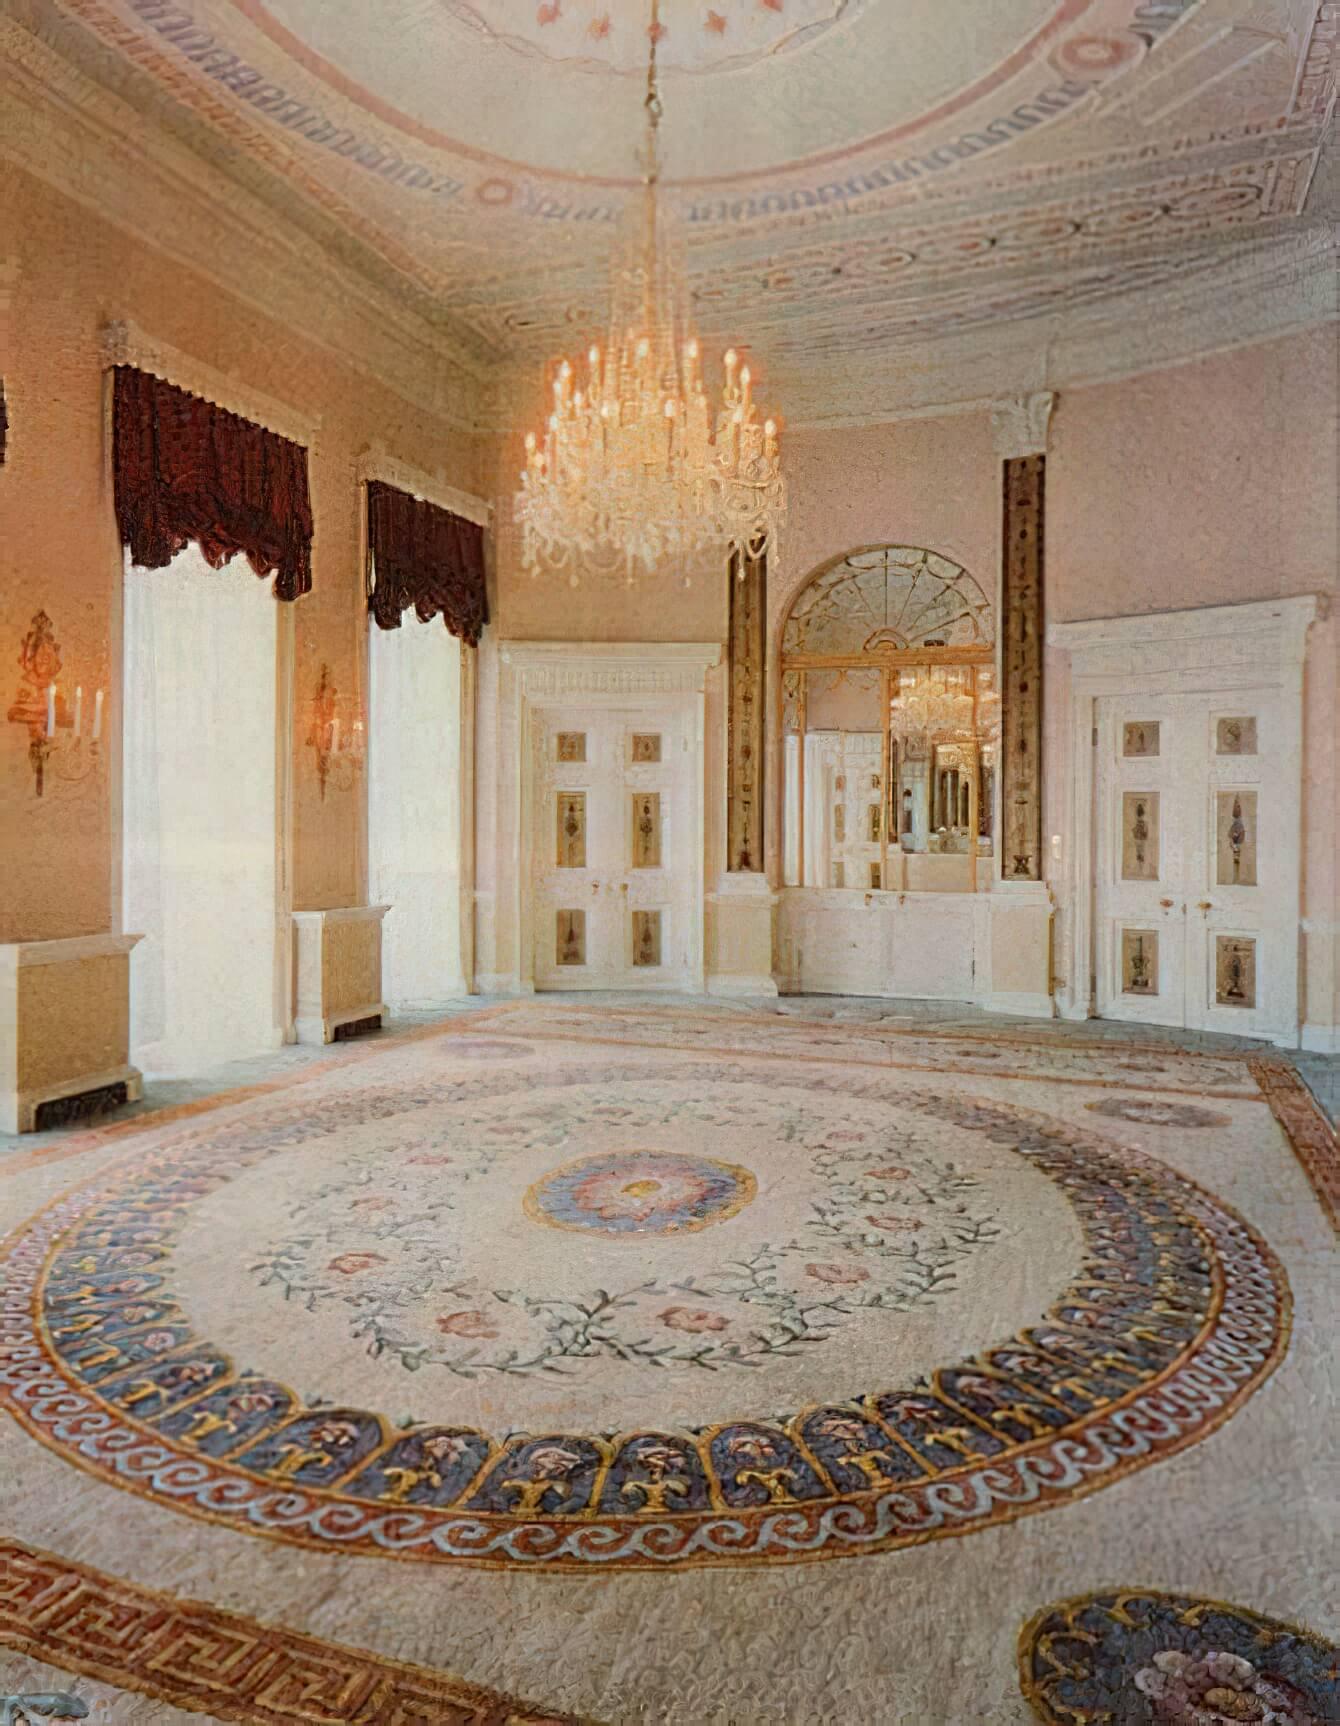 This Robert Adam rug